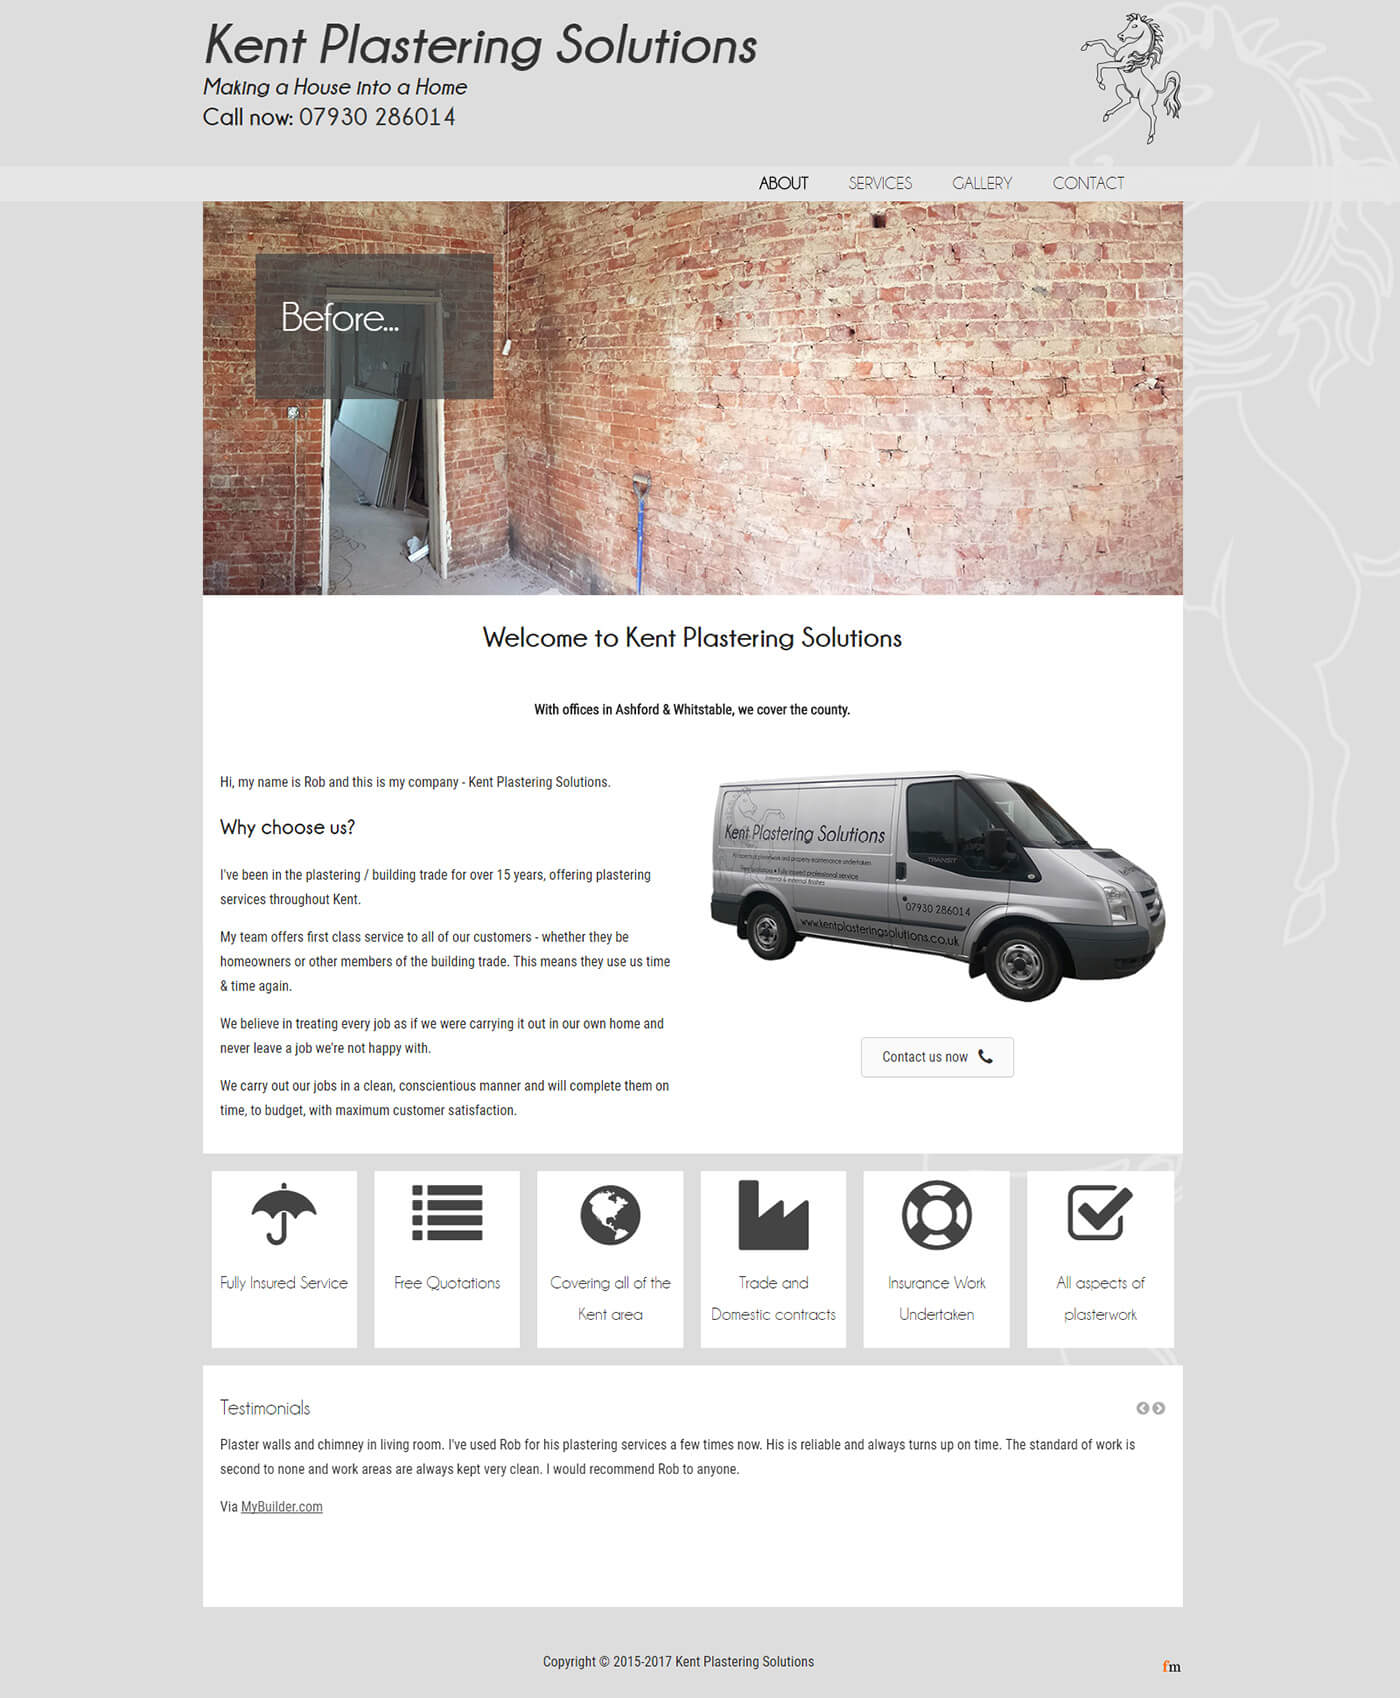 kent-plastering-solutions